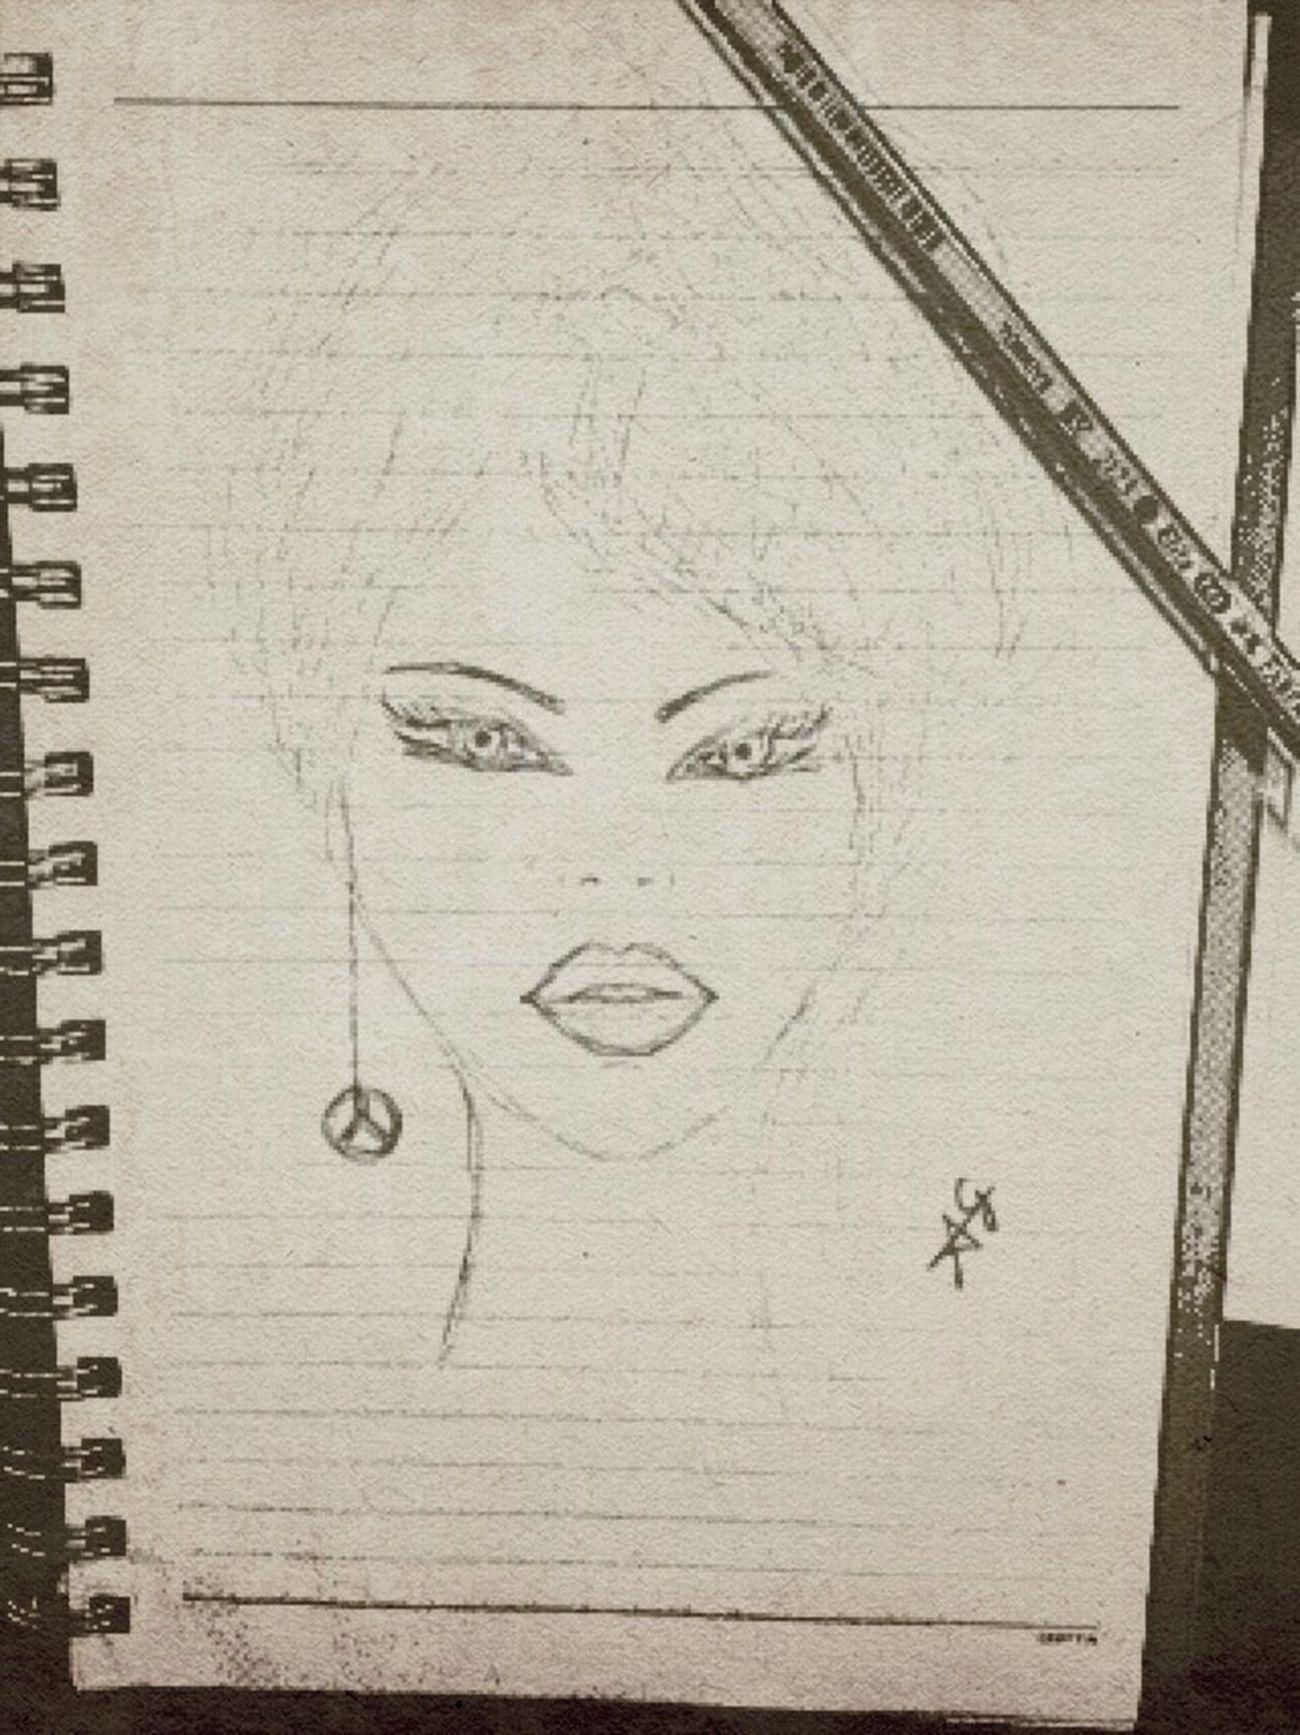 My personal art work... ✏️ Pencil drawing... Drawing Art Art, Drawing, Creativity ArtWork